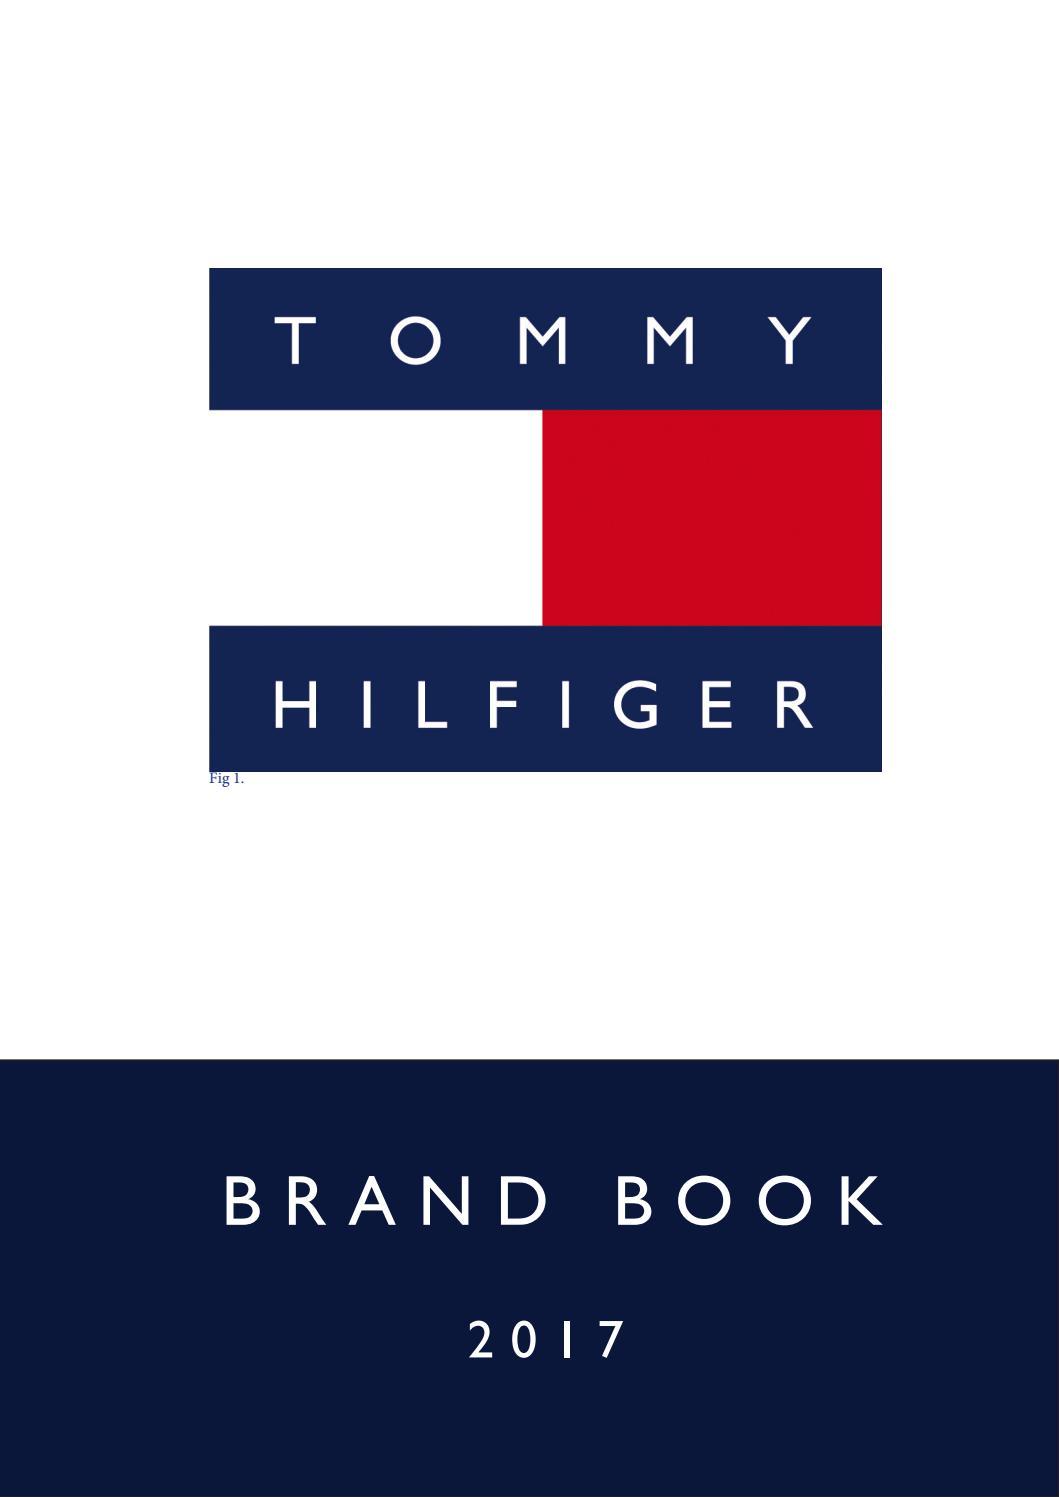 new tommy hilfiger logo